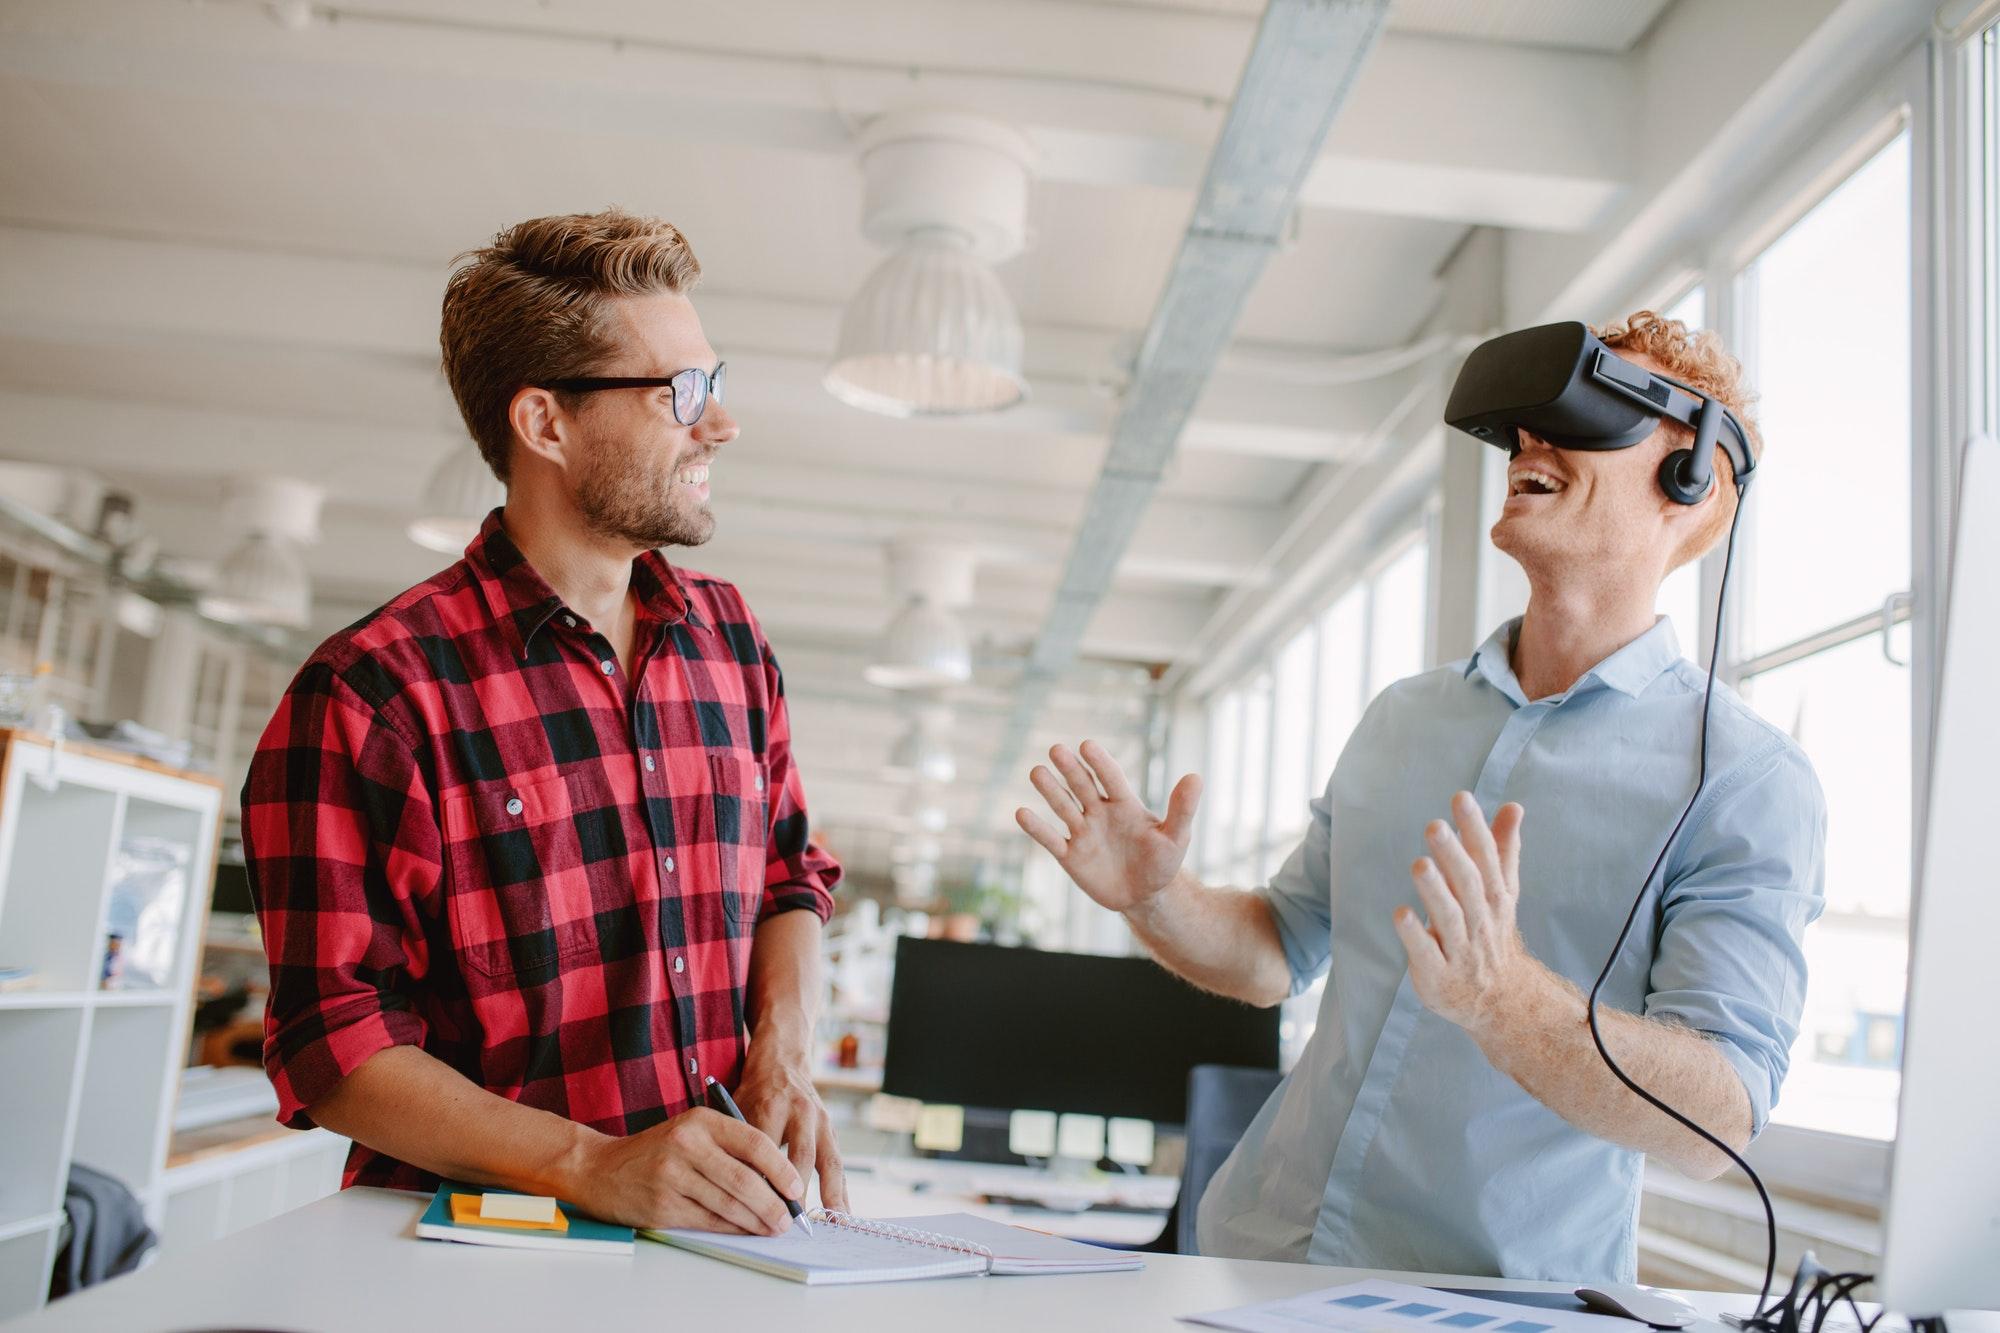 Young men testing virtual reality technology